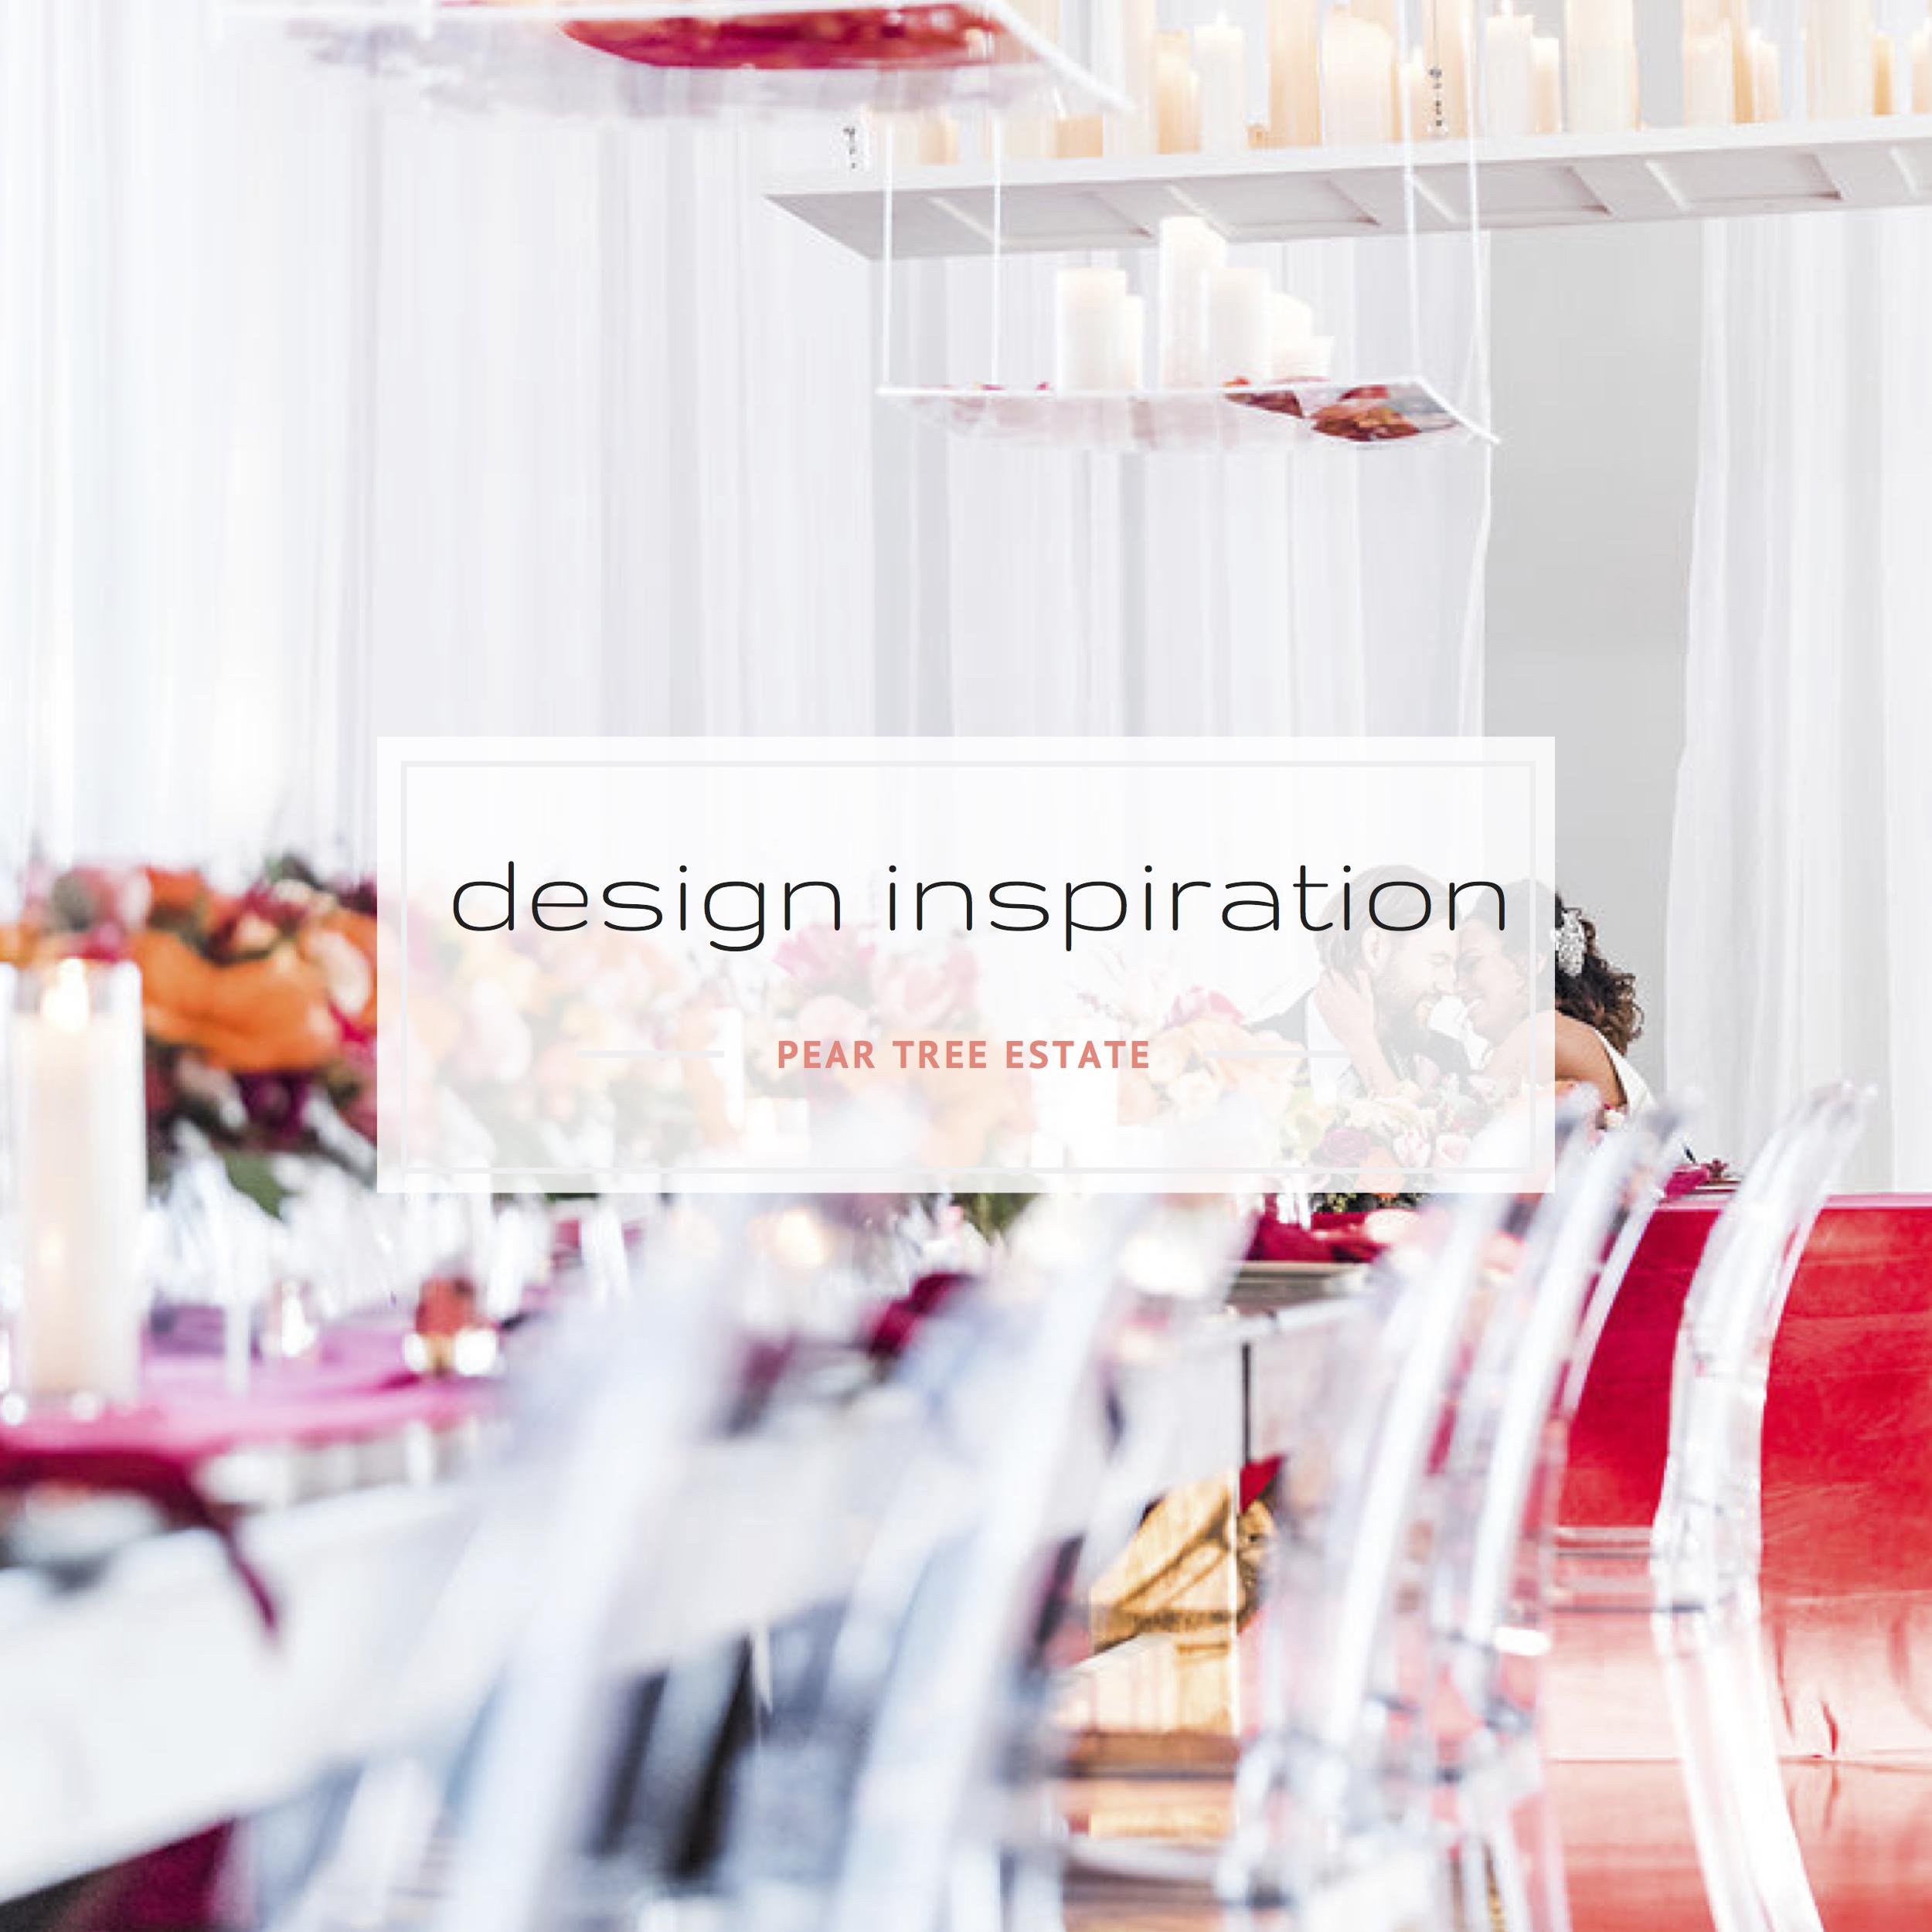 March 2017 Pg. 1 Design Inspiration Pear Tree Estate Styled Shoo.jpg